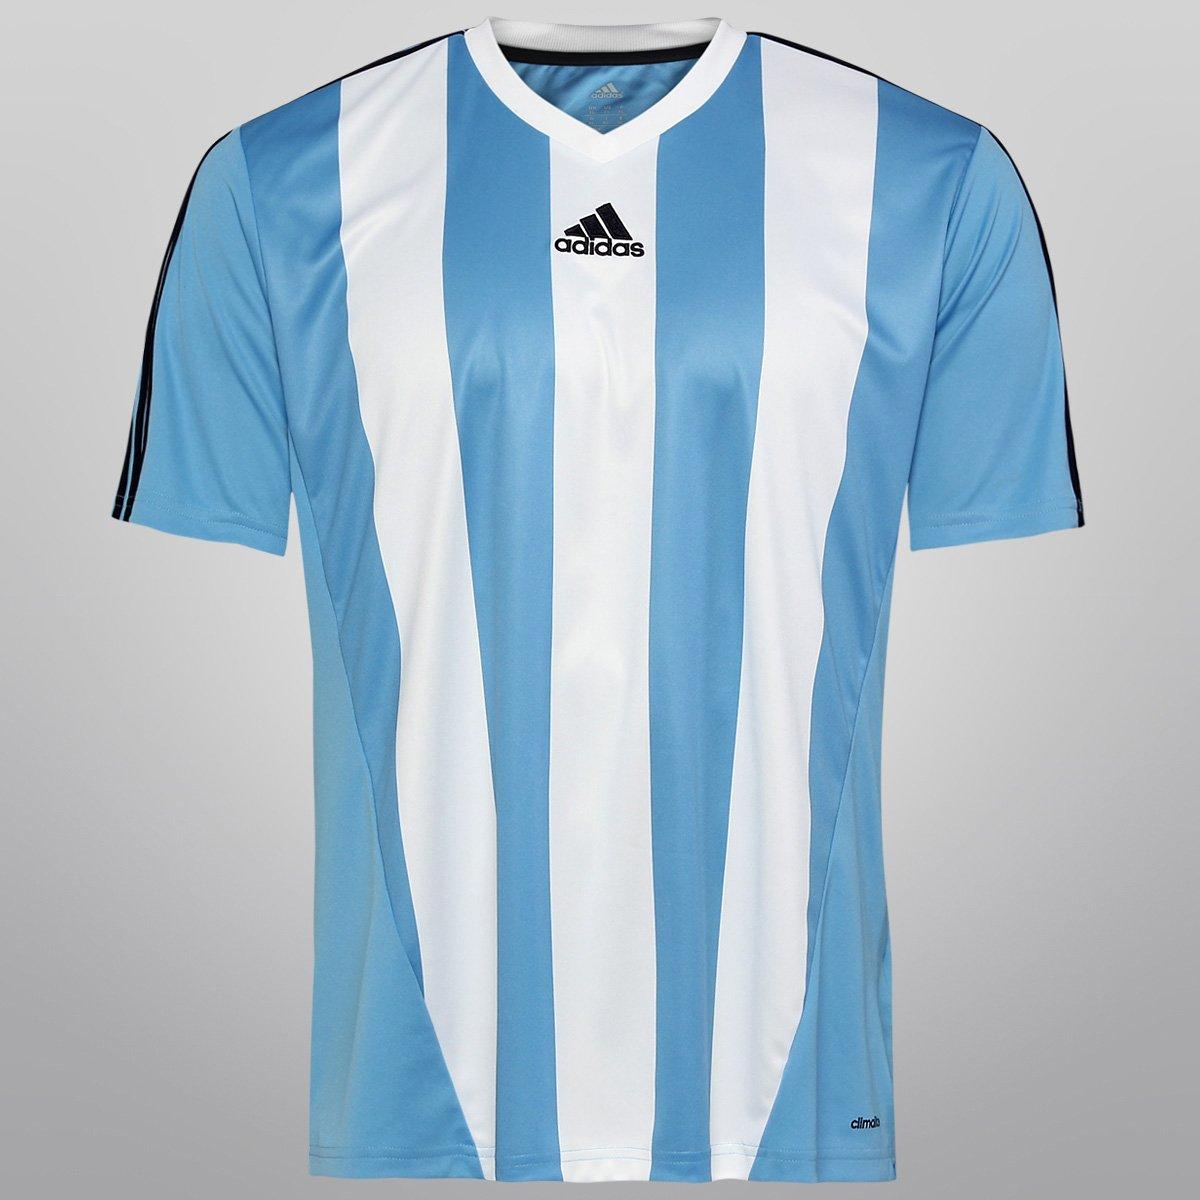 Camisa Adidas Inspired Masculina Azul Claro e Branco